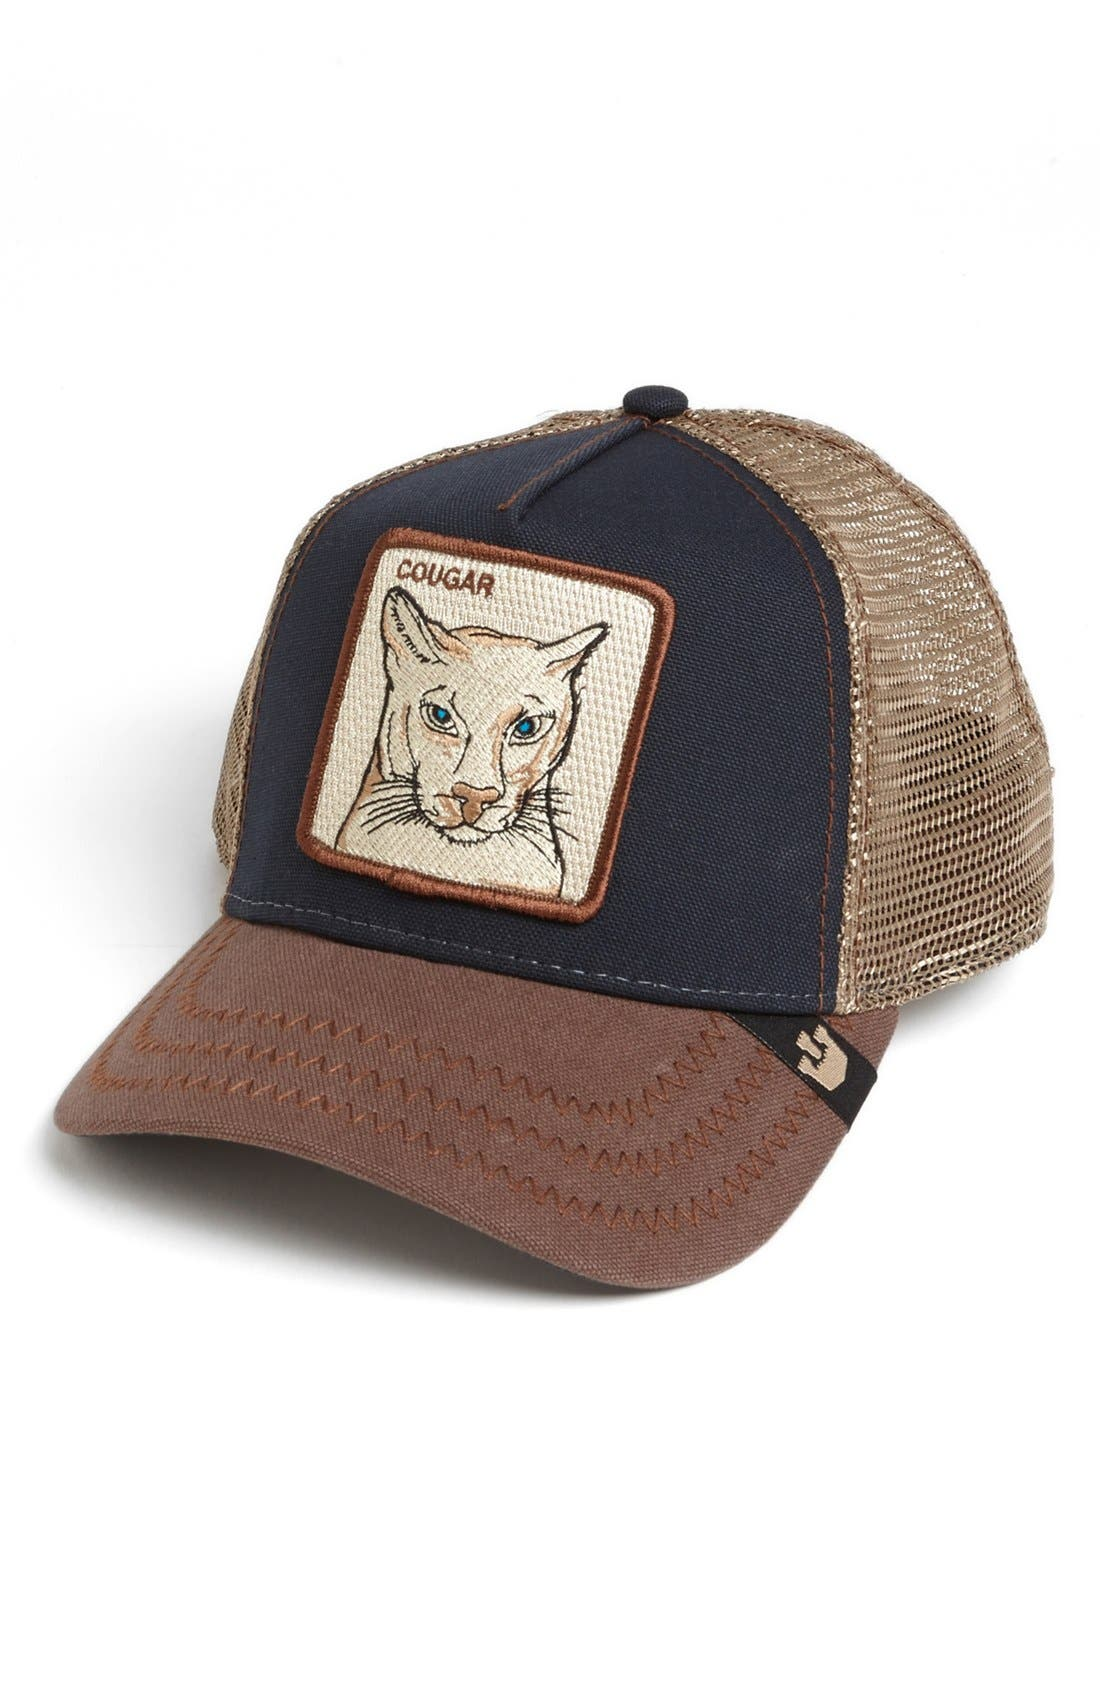 'Animal Farm - Cougar' Trucker Hat,                             Main thumbnail 1, color,                             NAVY